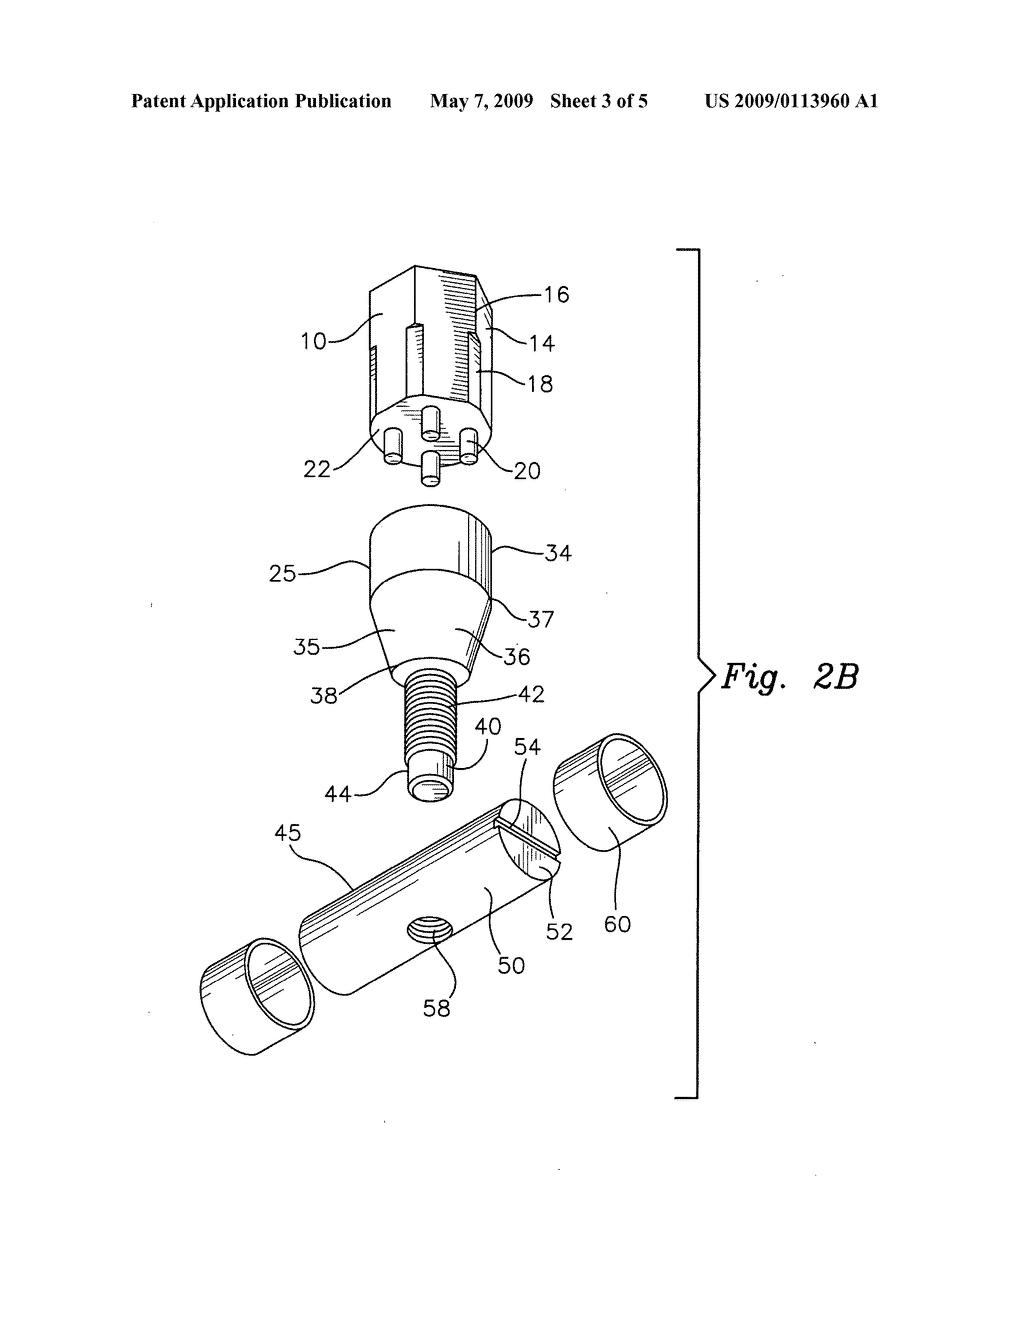 outboard motor lower unit lock diagram, schematic, and image 04 225 mercury outboard lower unit diagram outboard motor lower unit diagram #11